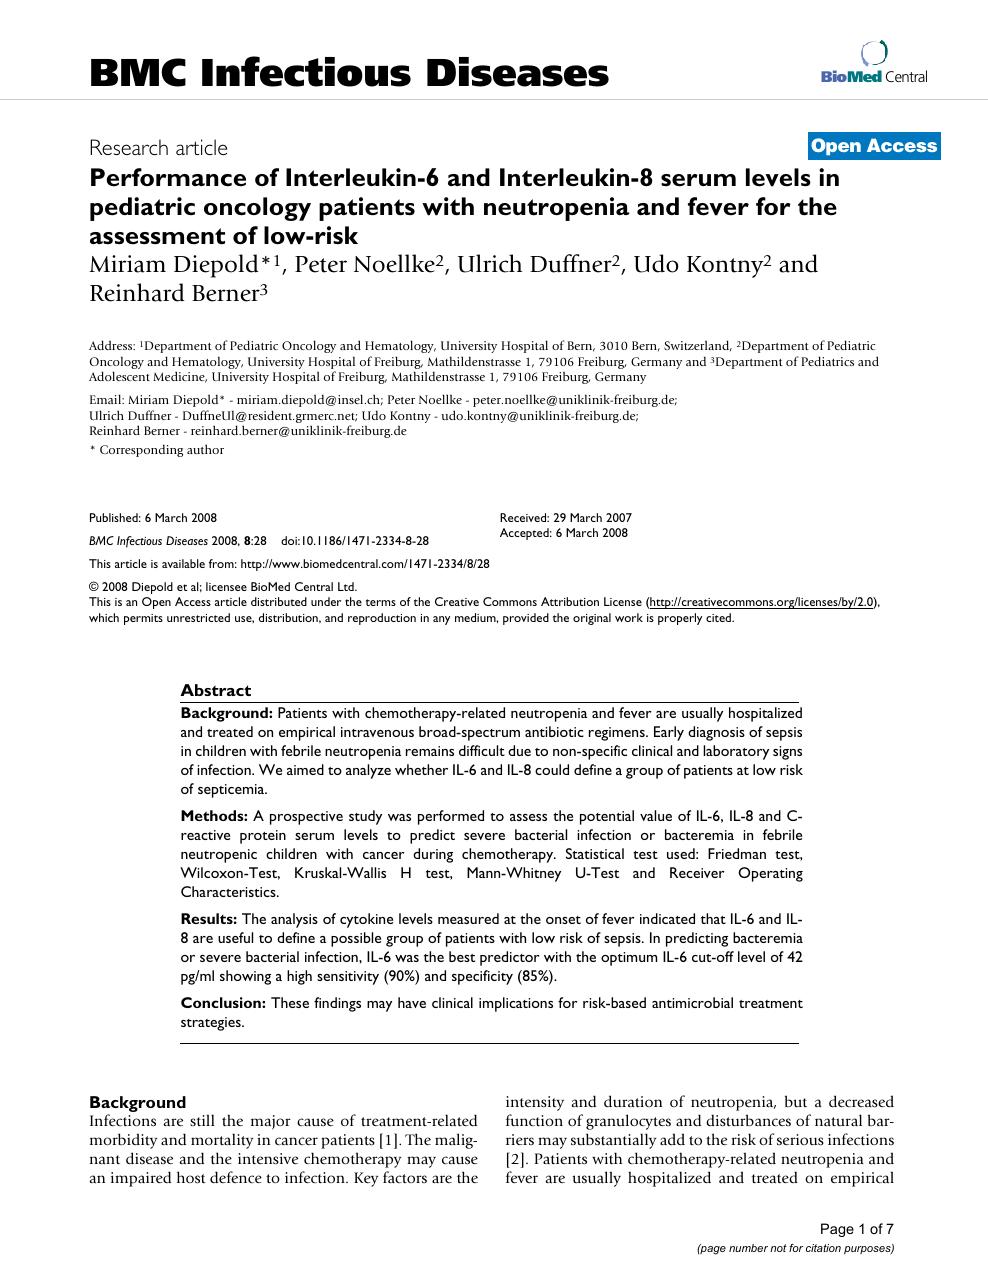 Performance of Interleukin-6 and Interleukin-8 serum levels